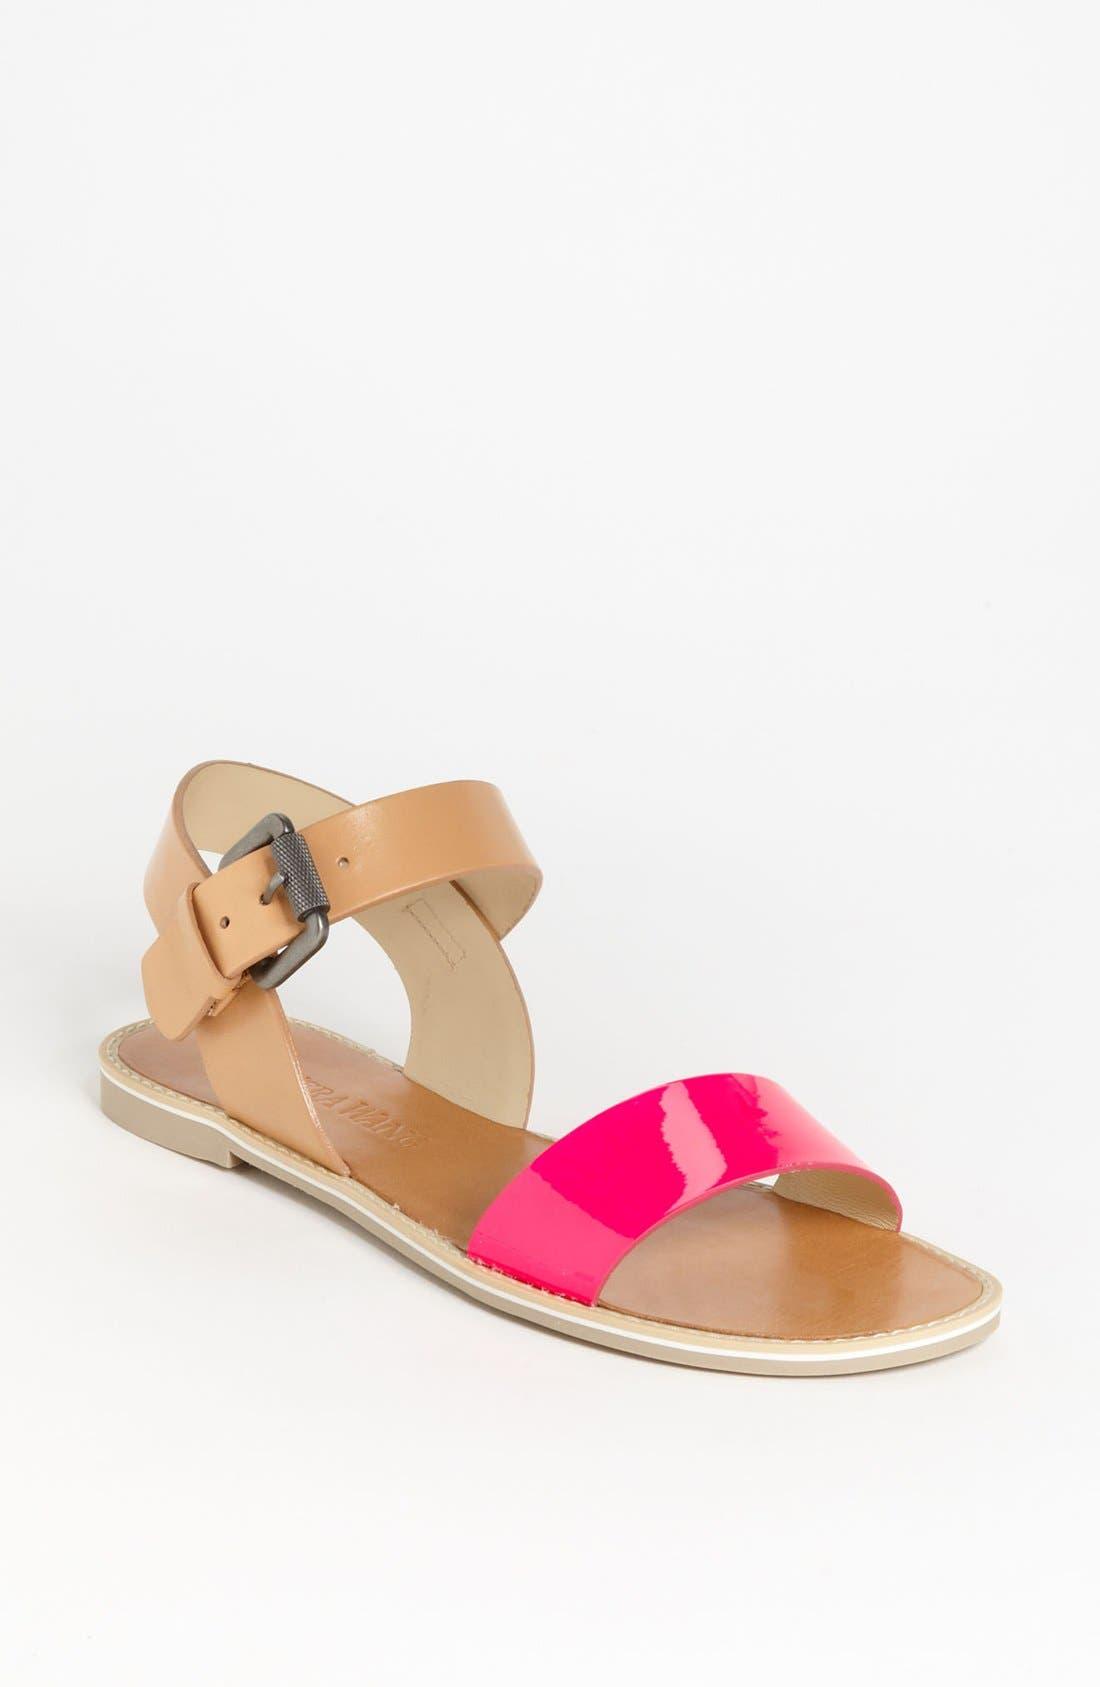 Main Image - Vera Wang Footwear 'Febe' Sandal (Online Only)